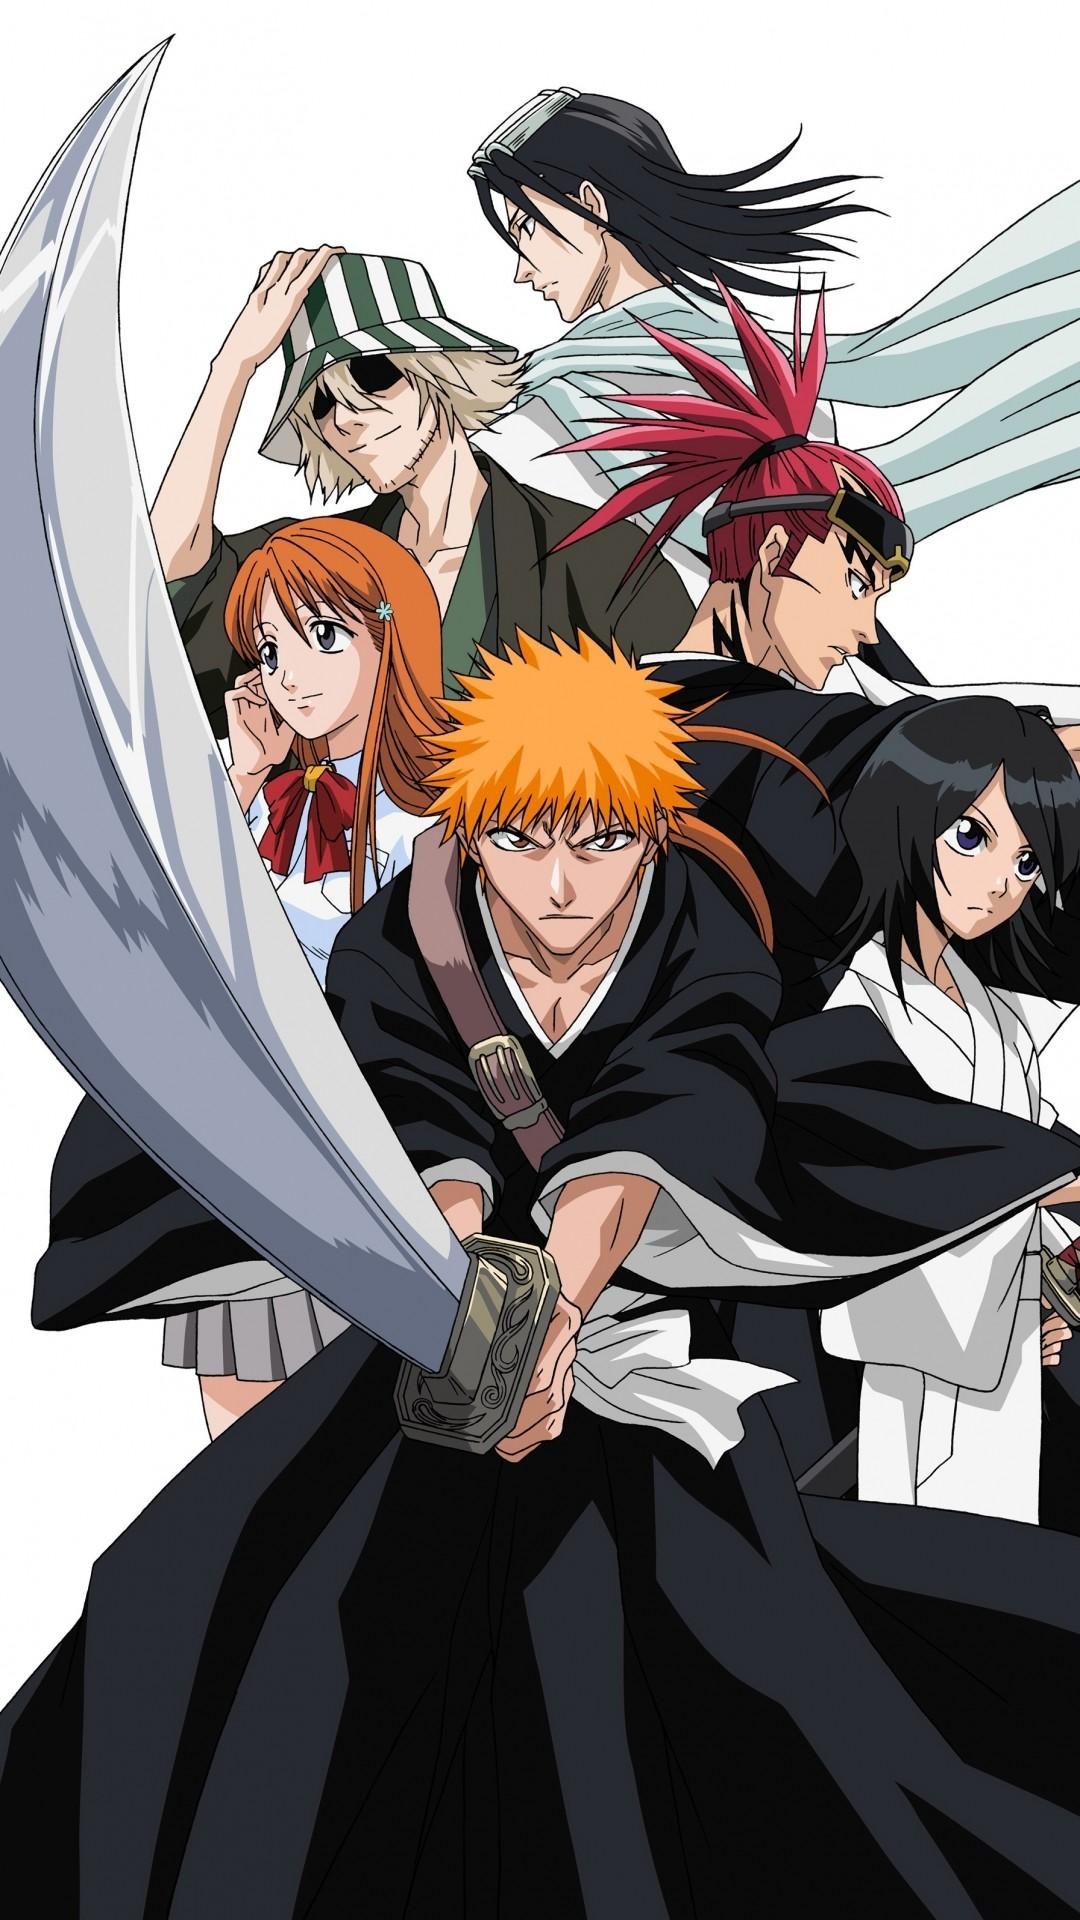 Bleach anime wallpaper 71 images - Anime wallpaper for tablet 7 inch ...